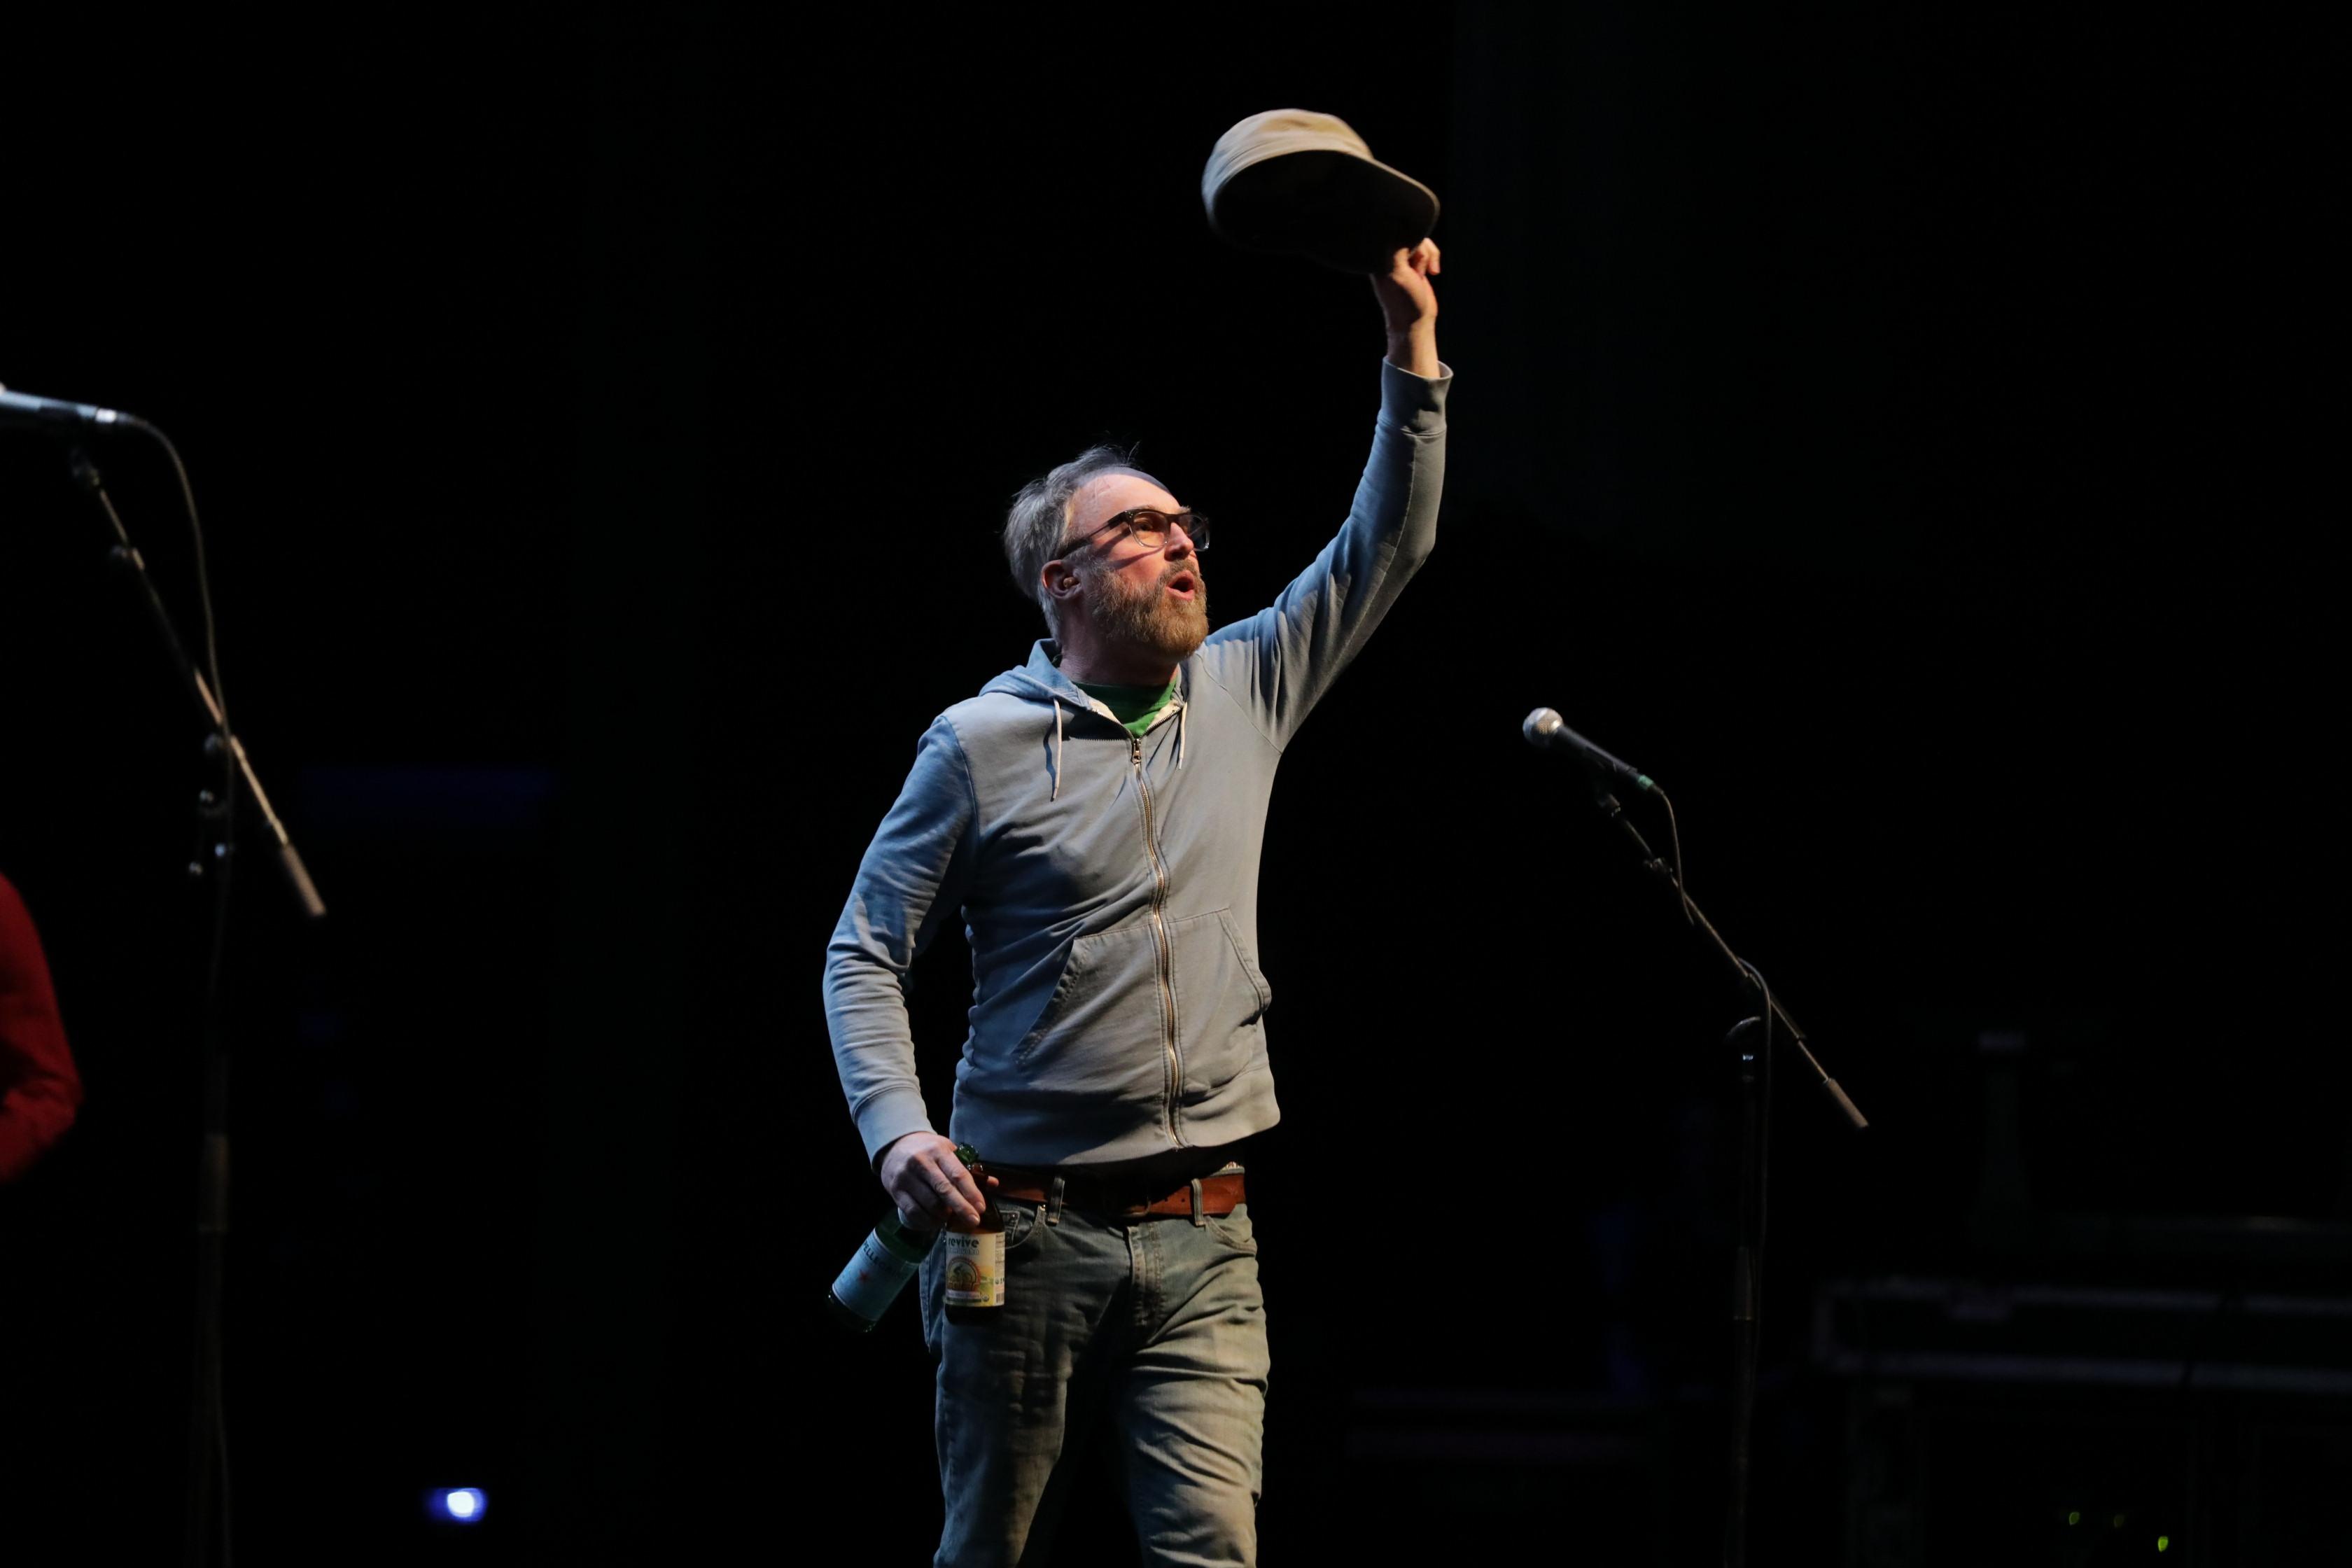 CAKE frontman John McCrea enters onstage. Photo: Lmsorenson.net